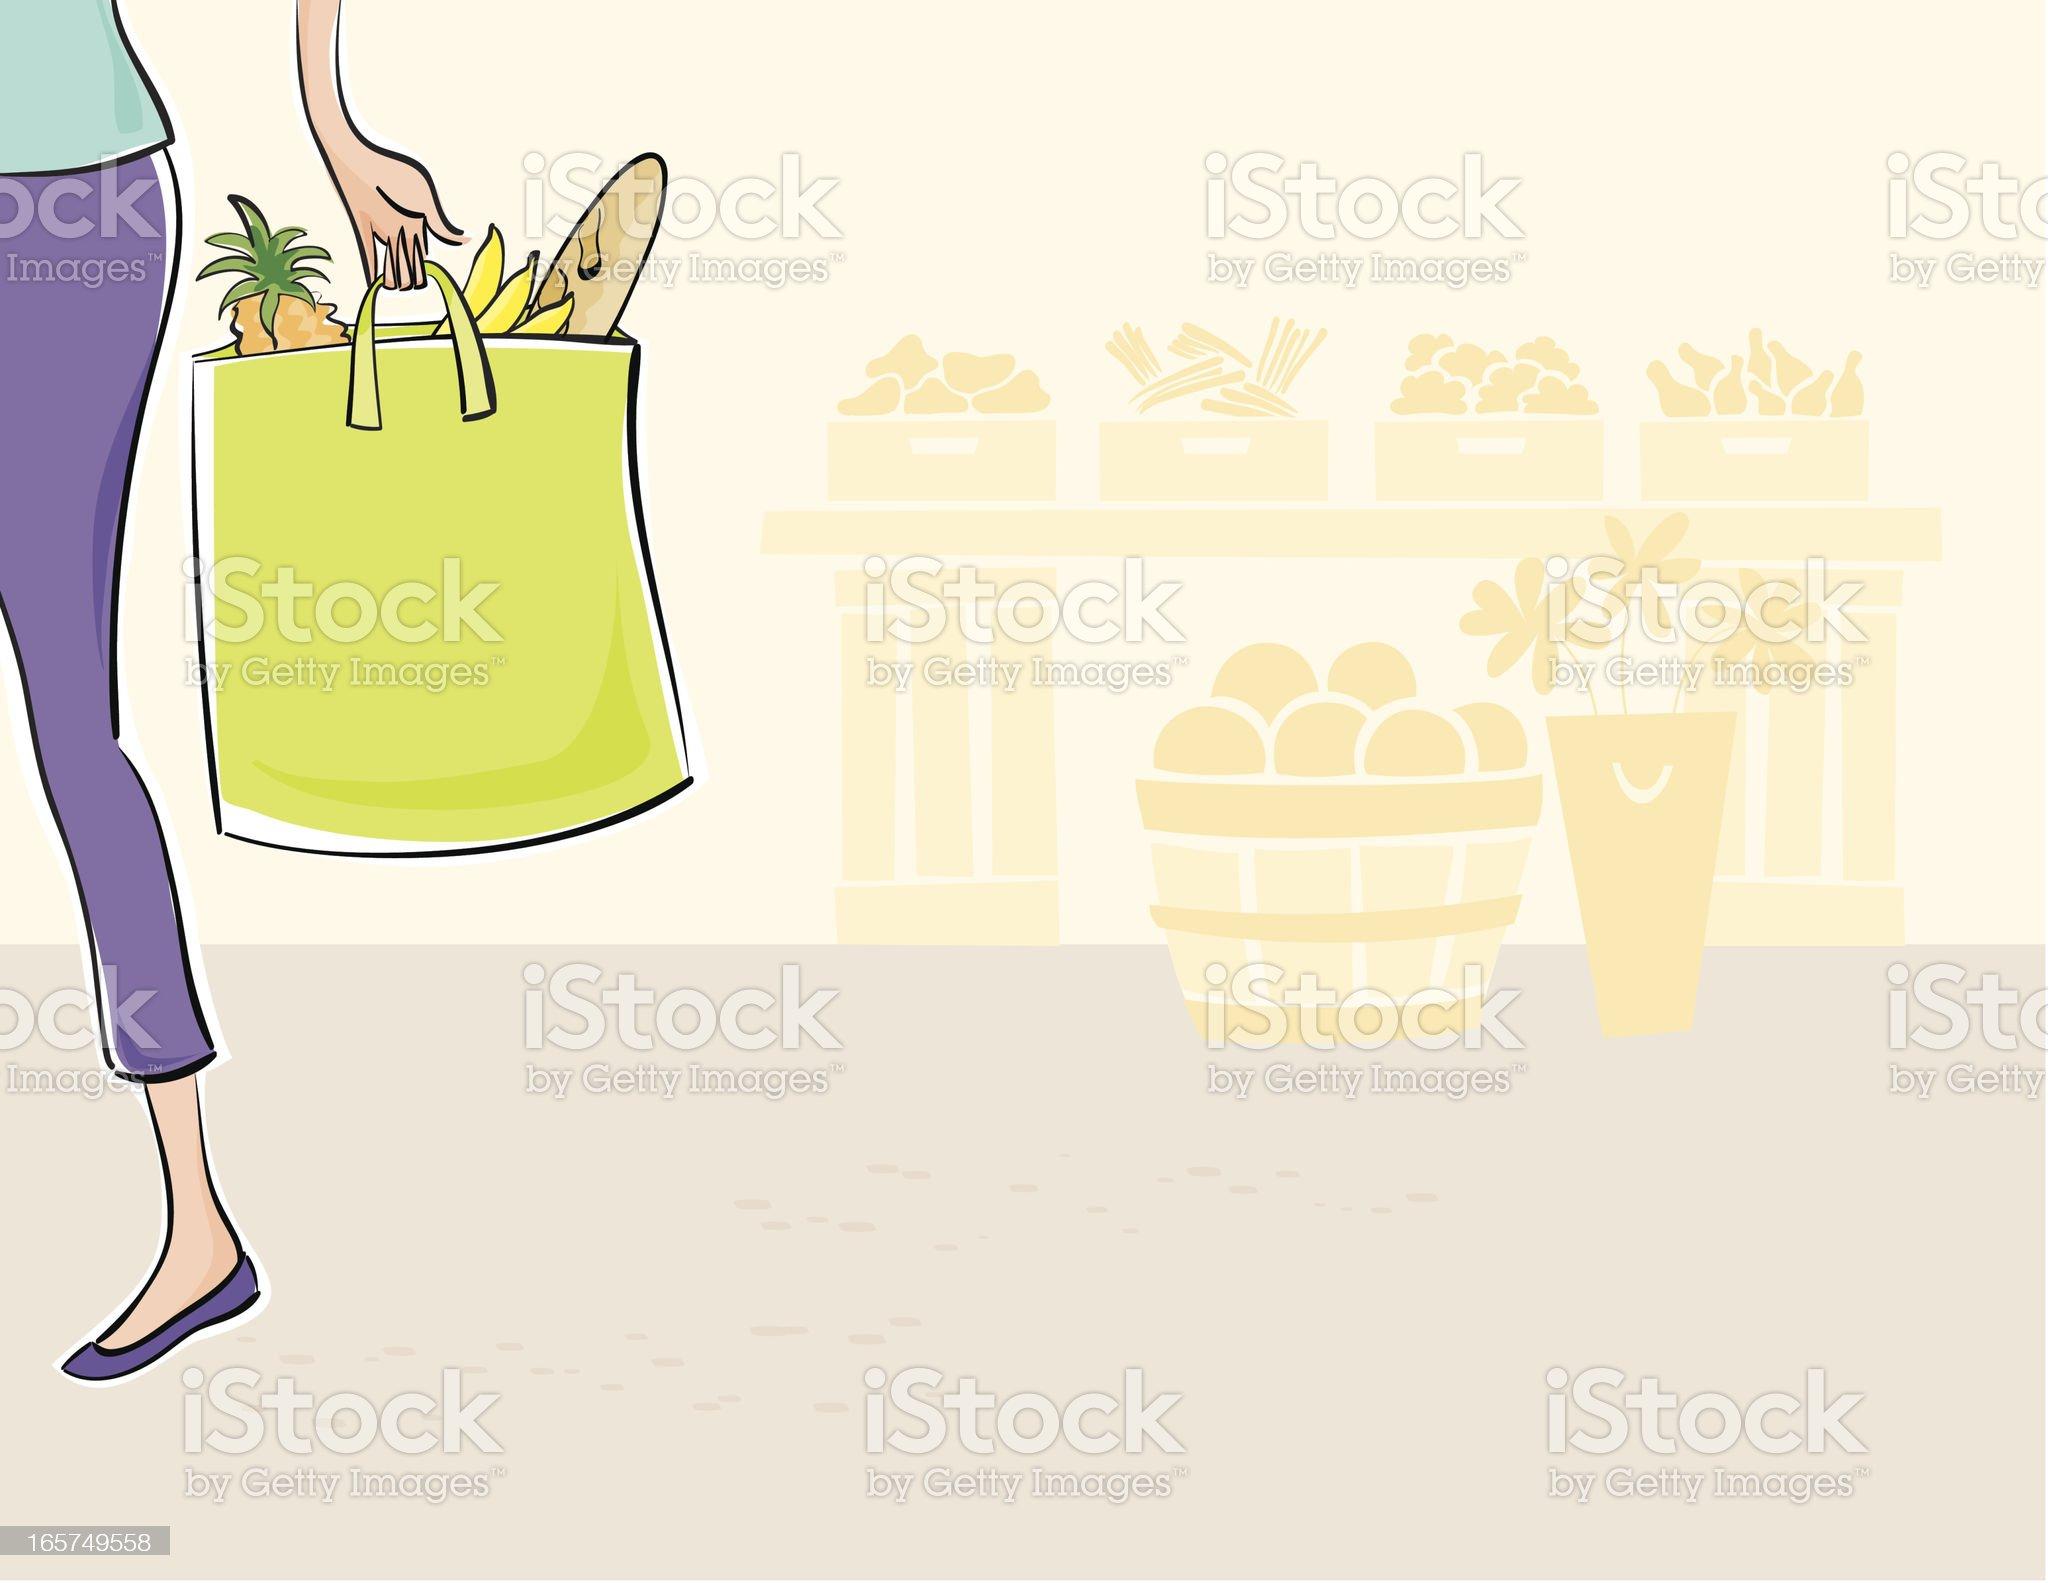 Shopping at the Farmers Market royalty-free stock vector art